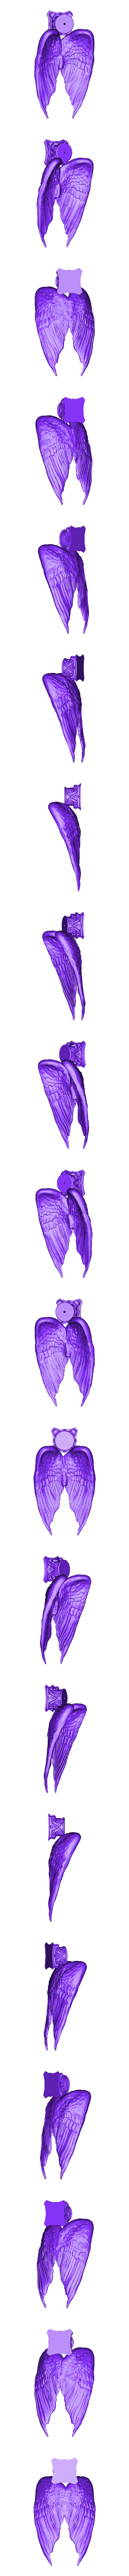 Angel_Wing_Sculpture.stl Download free STL file Angel Wing Sculpture • 3D printable model, FiveNights